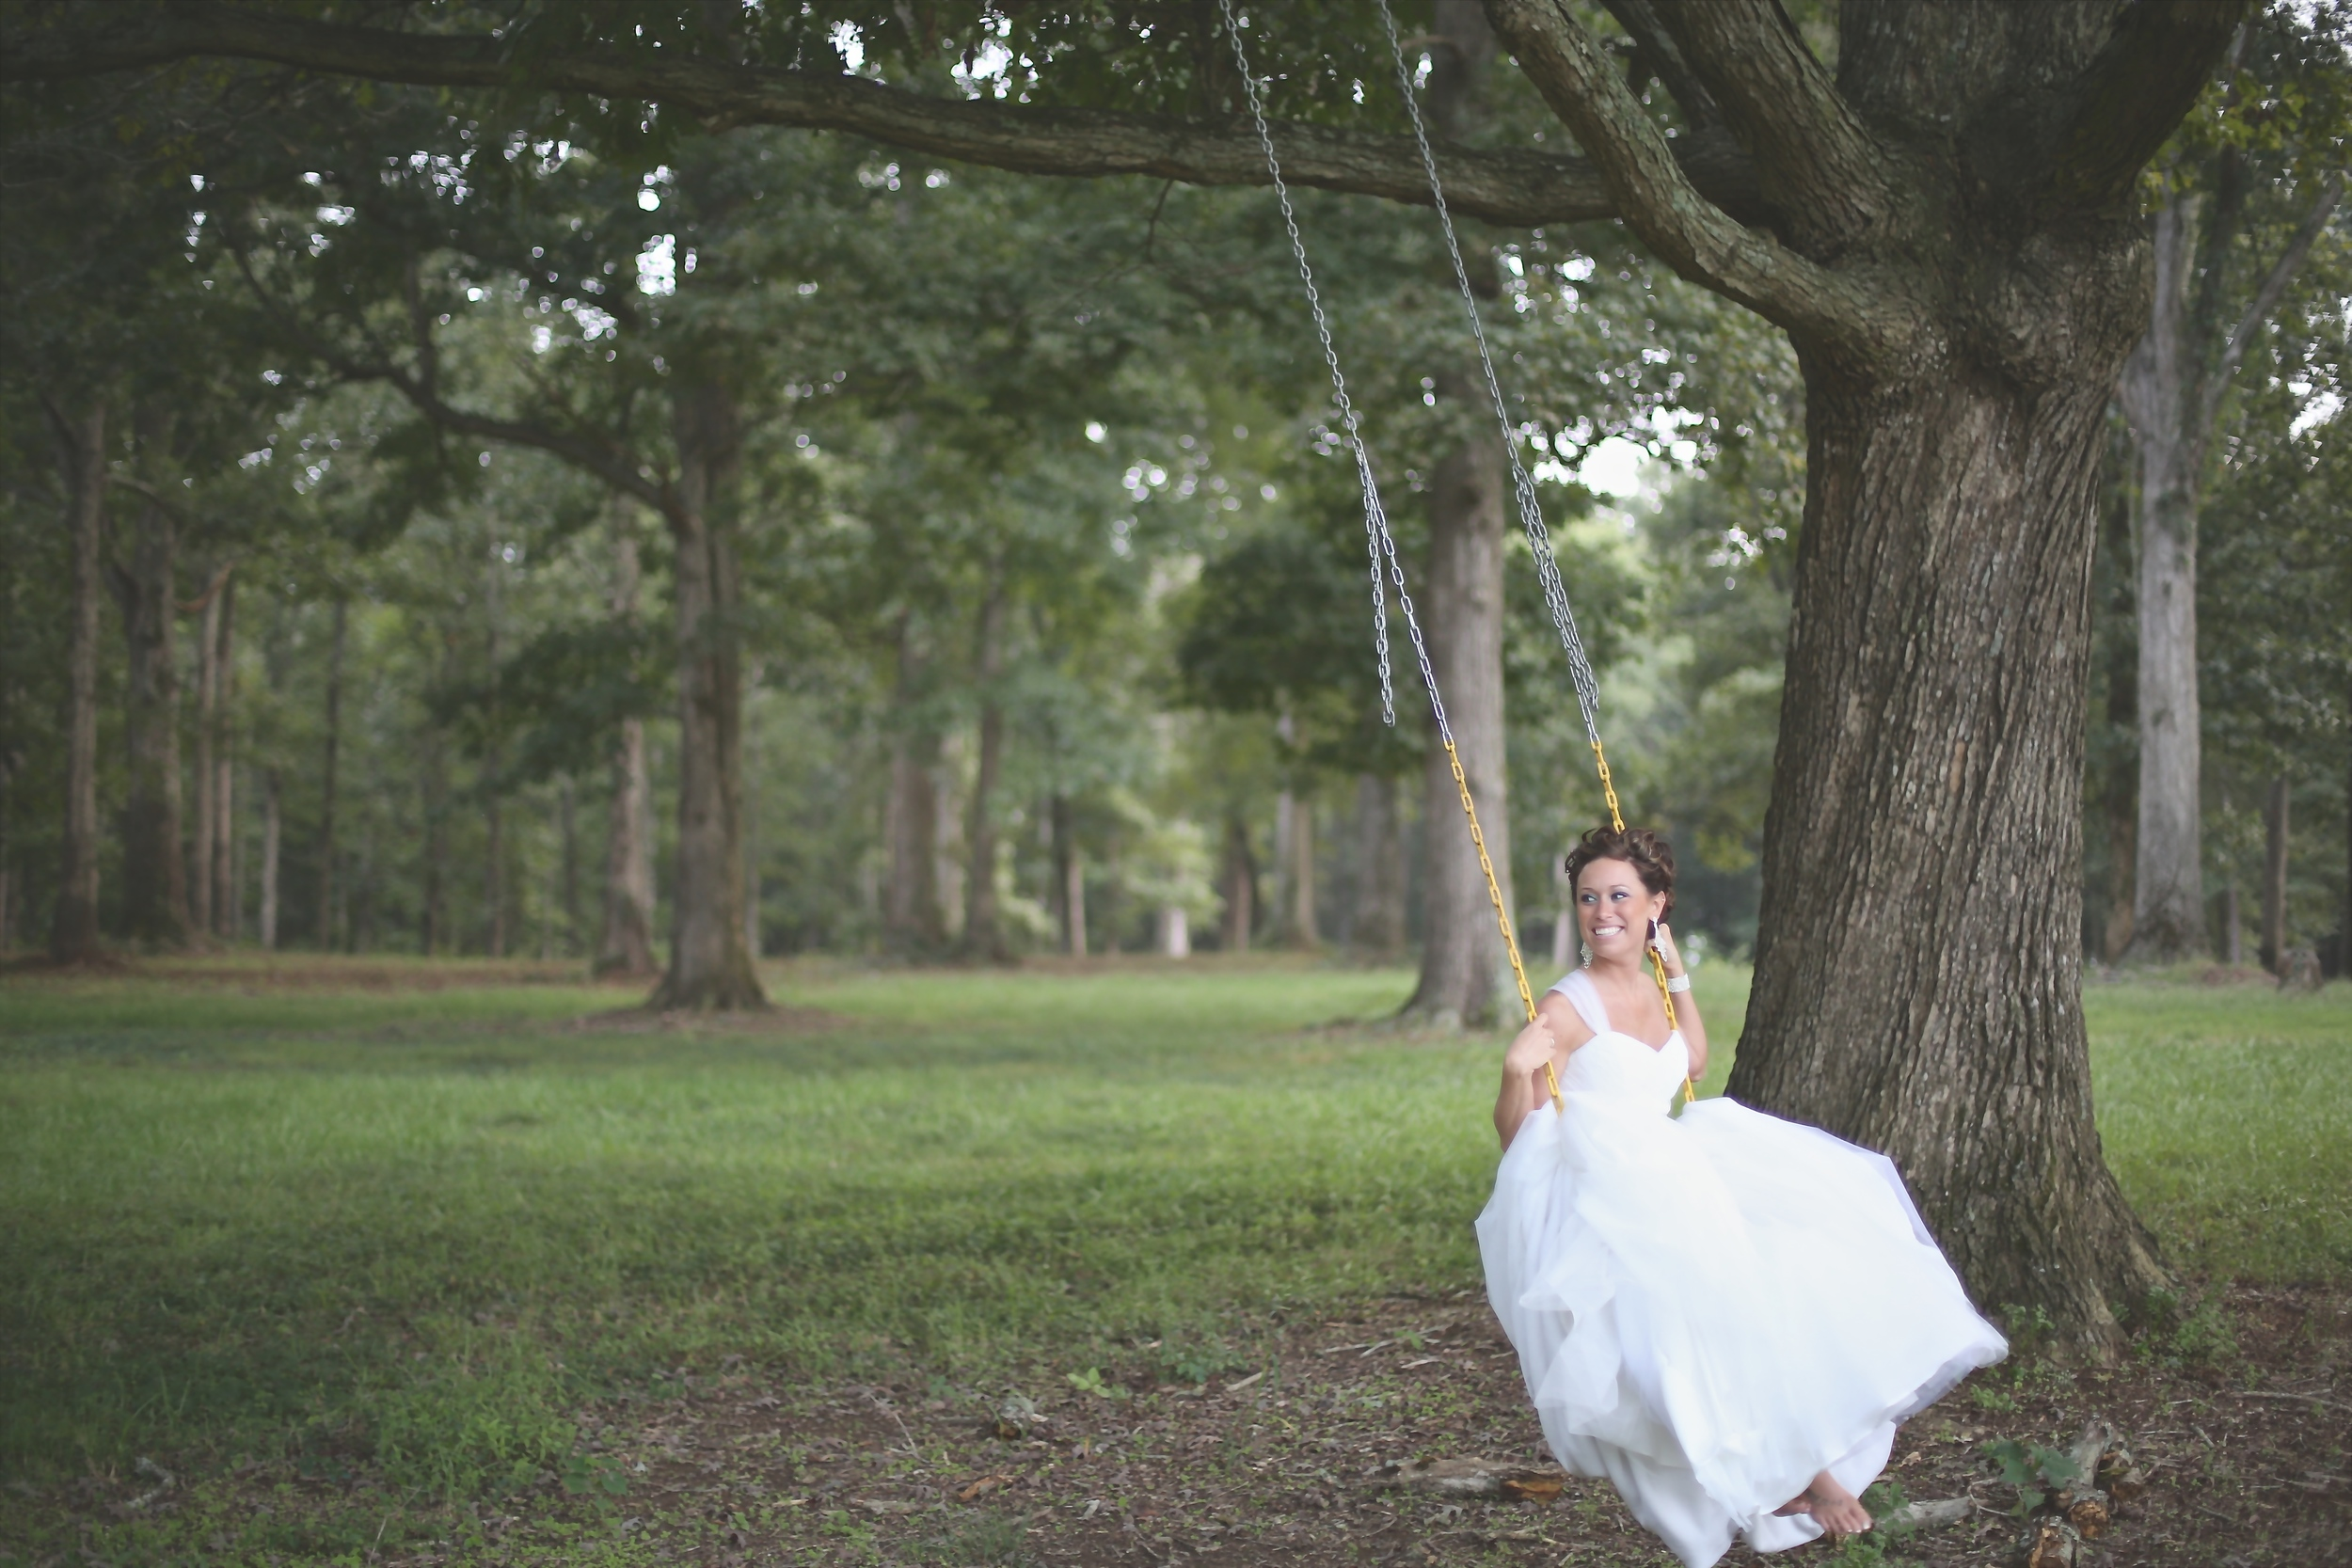 joanna bridal shoot 38